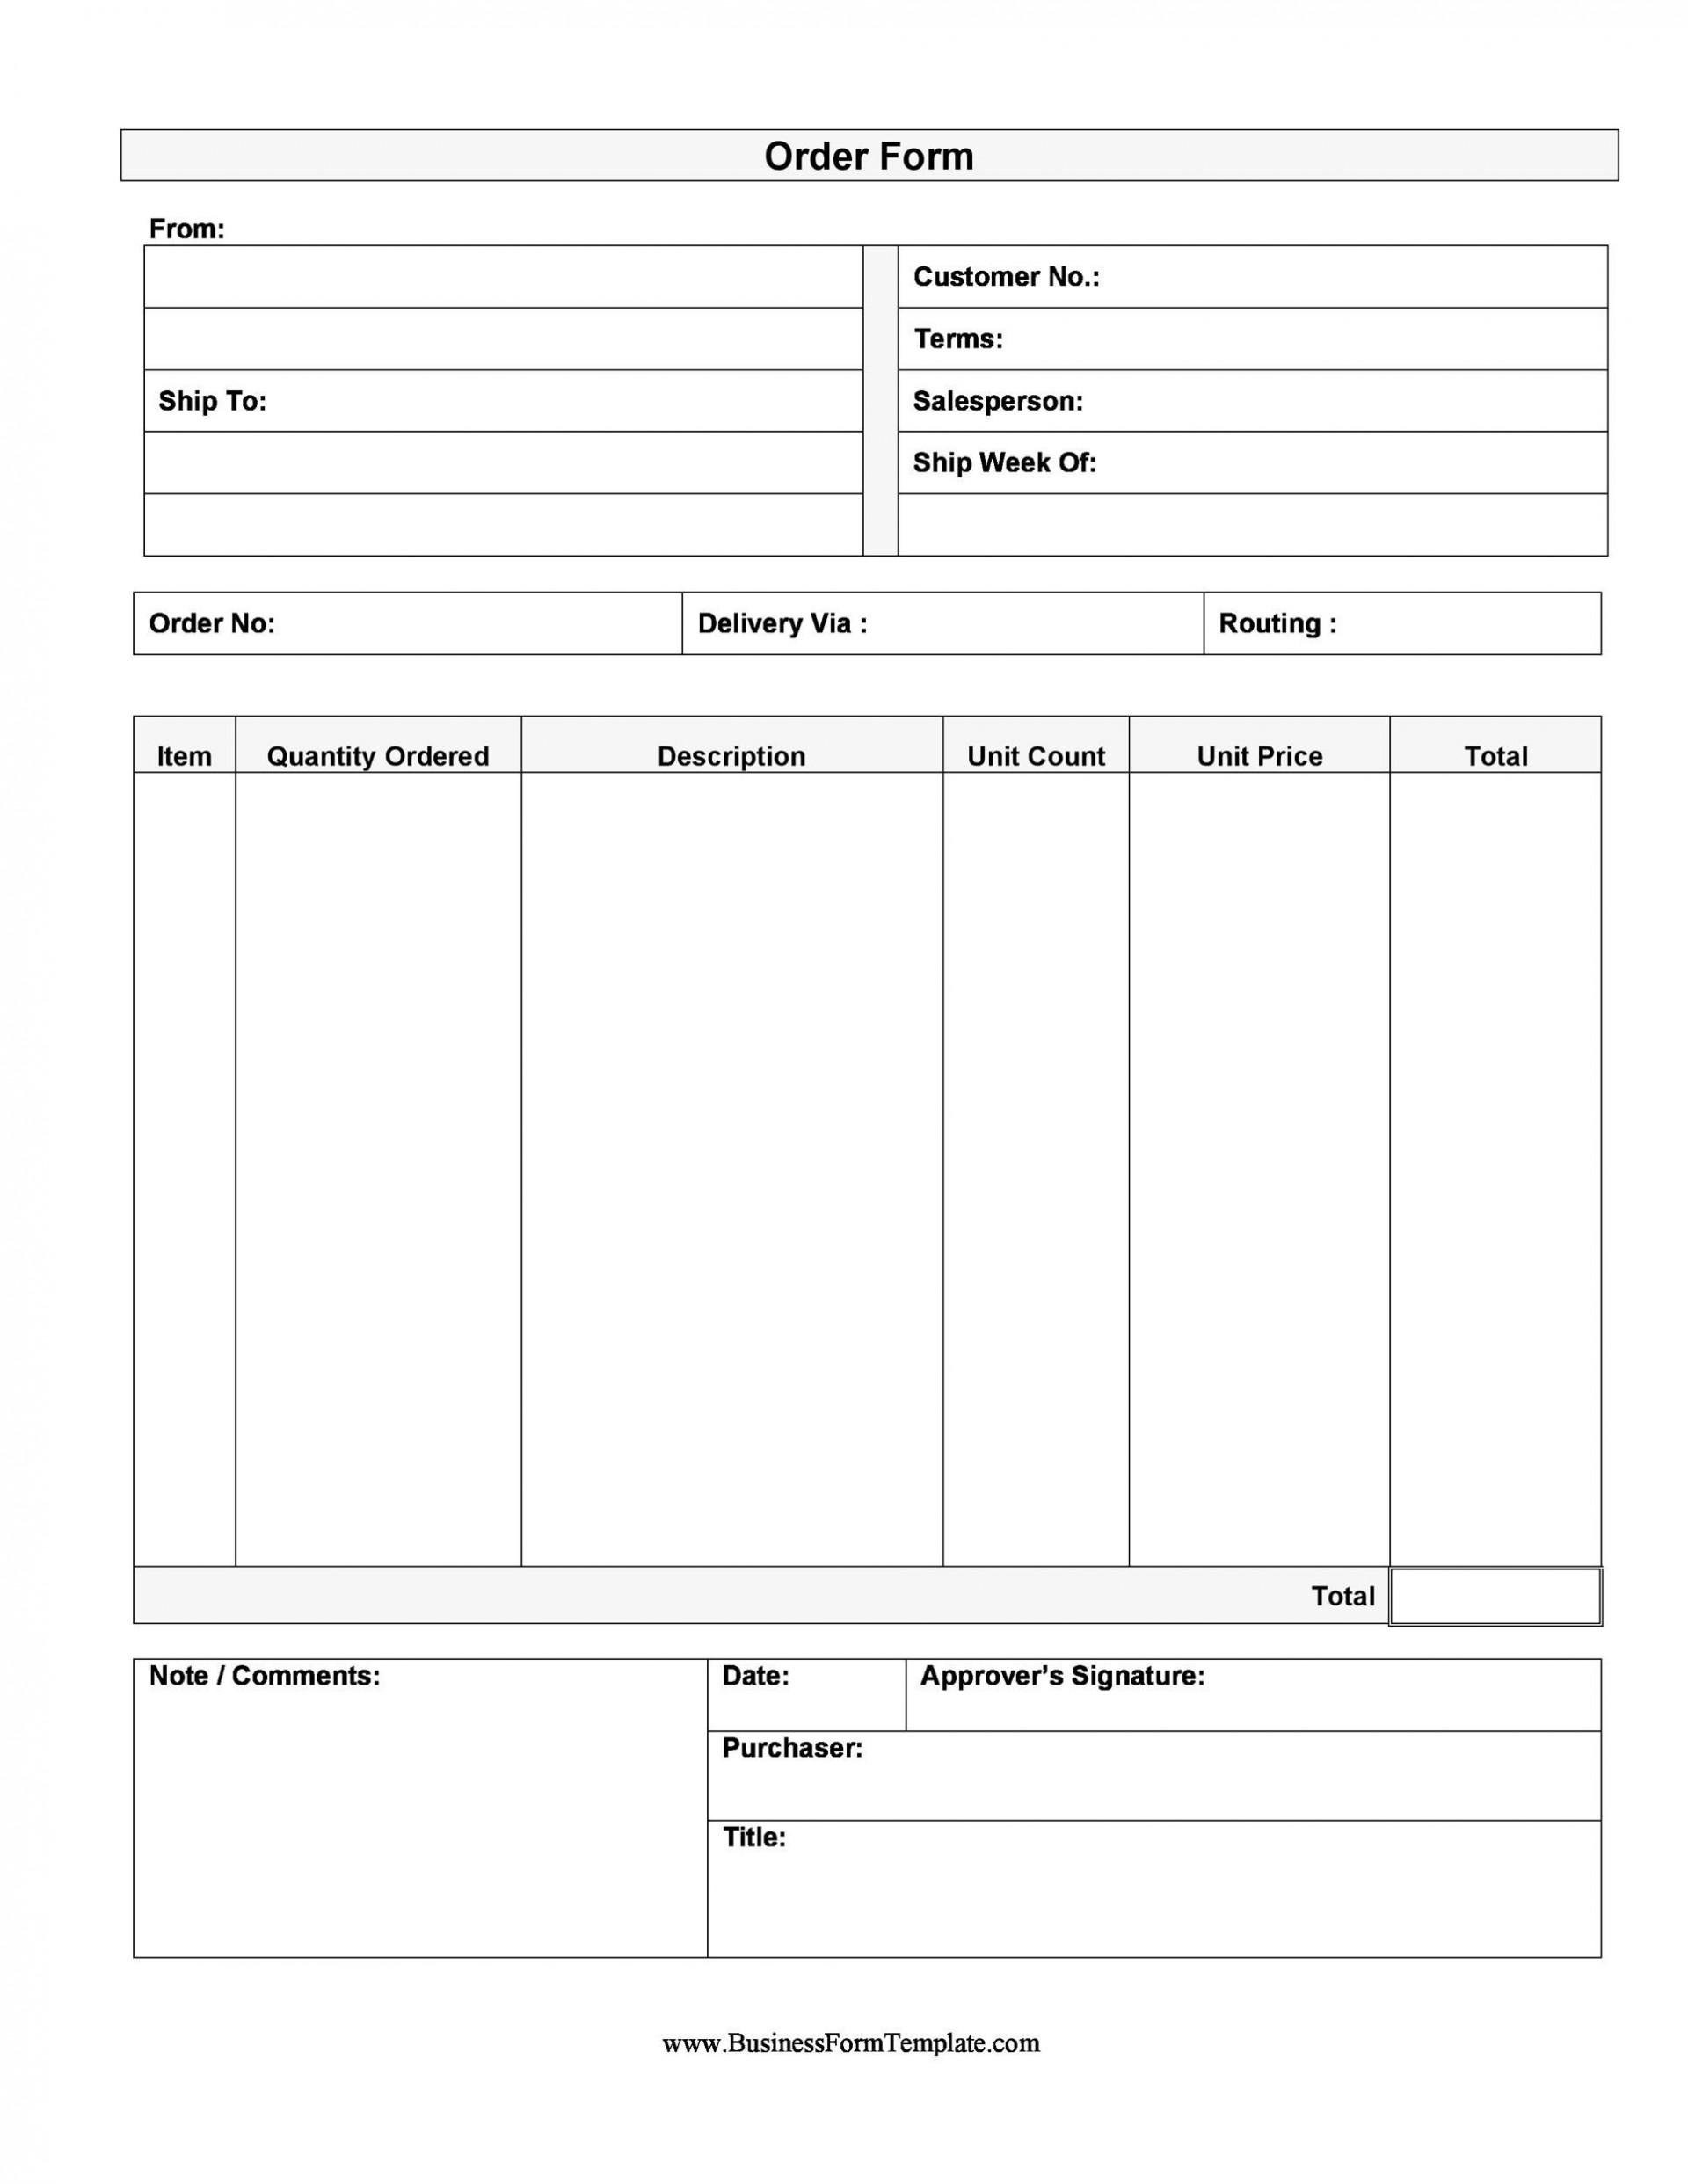 007 Surprising Order Form Template Free High Def  Application Shirt Word Custom1920